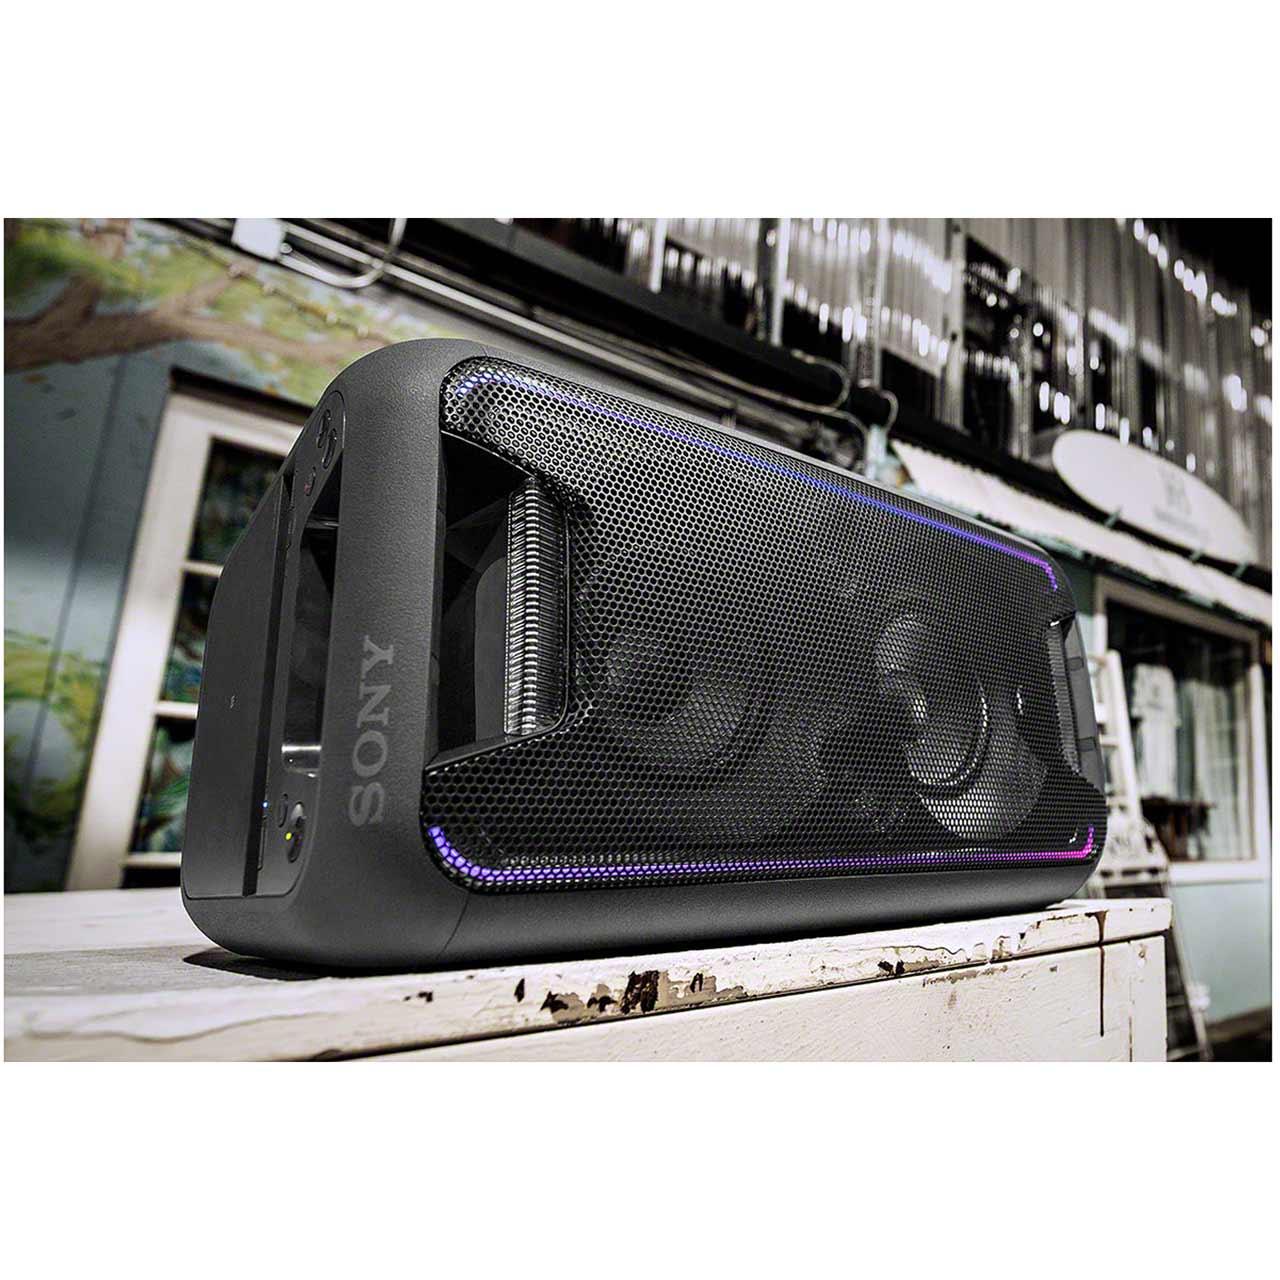 Sony GTKXB5B.CEK Compact High Power One Box Music System with Lighting Effects 4548736036338 | eBay